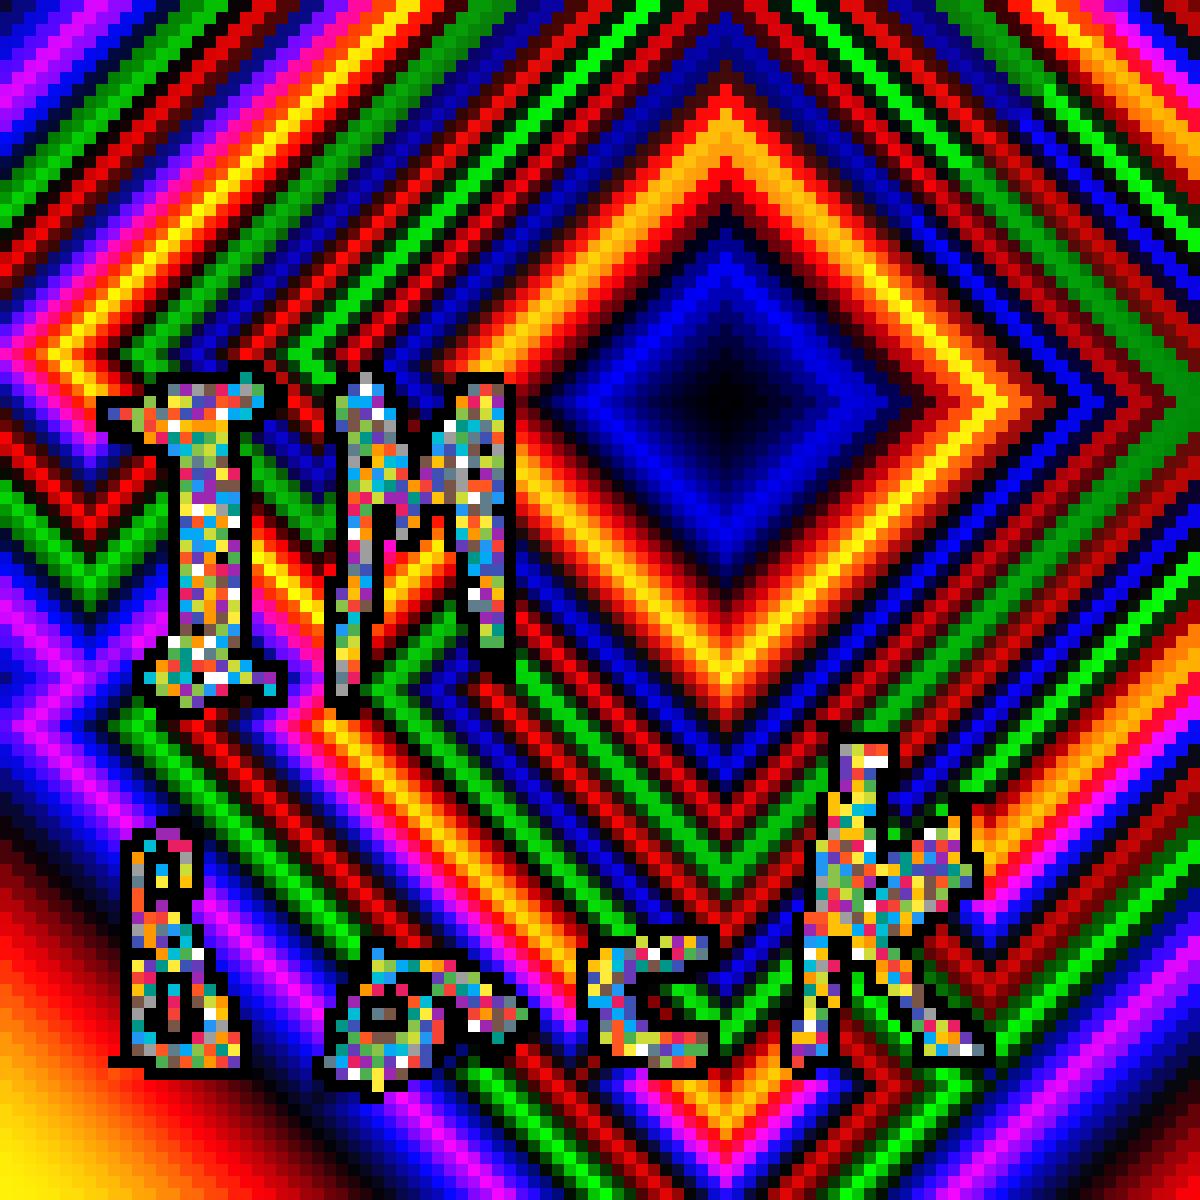 IM BACK by PixelDab